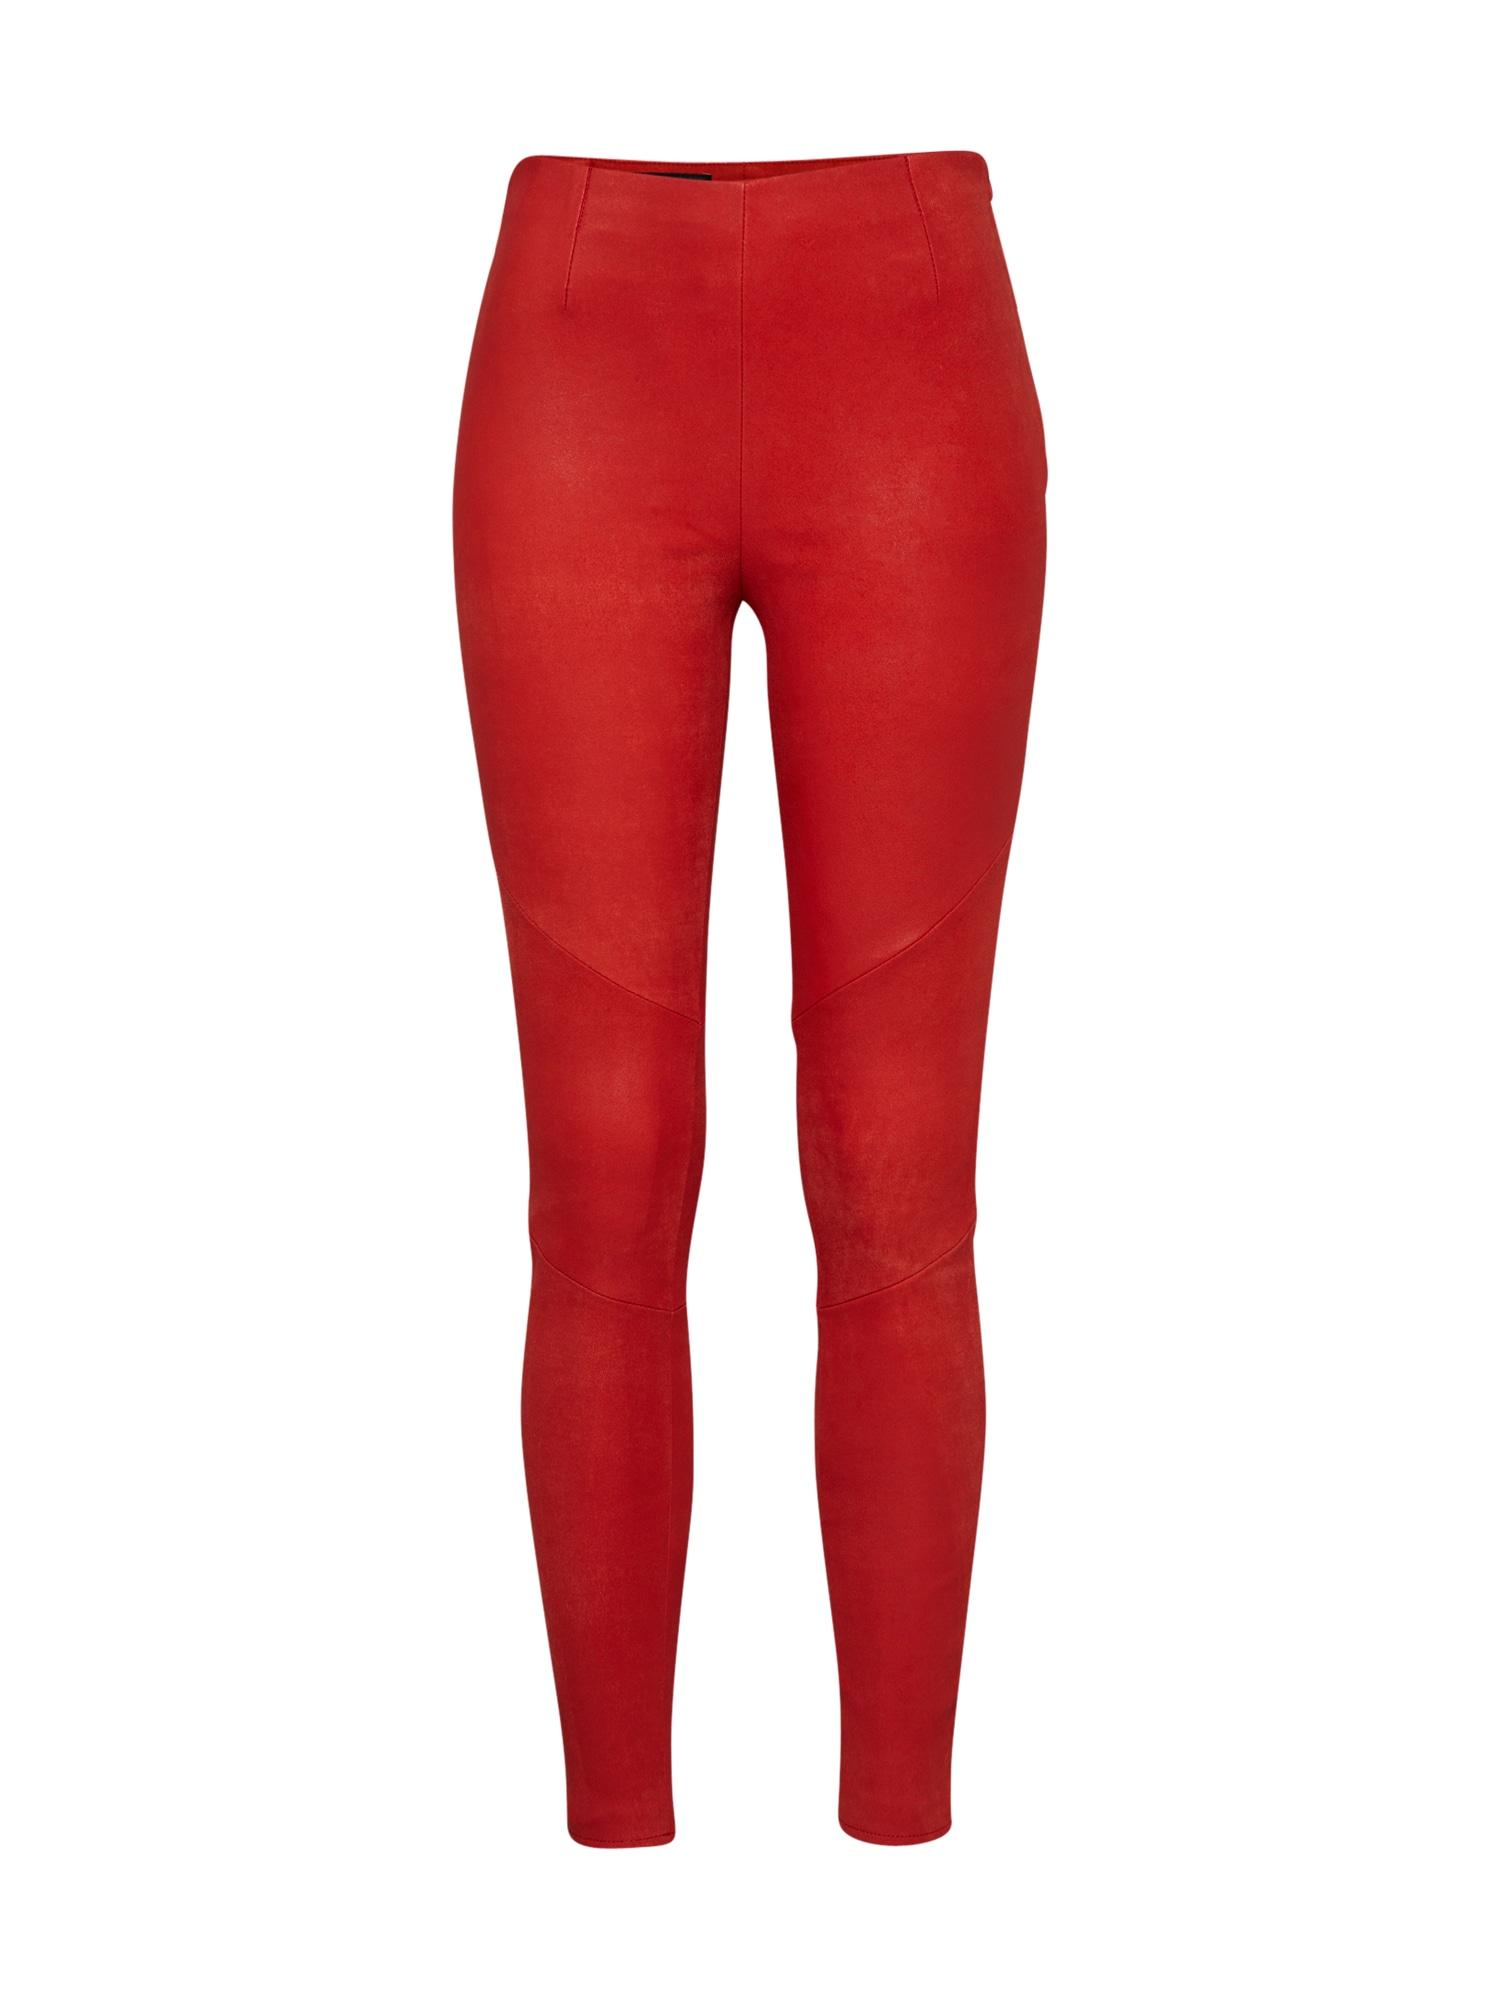 Kalhoty Nori Buffed červená Tigha